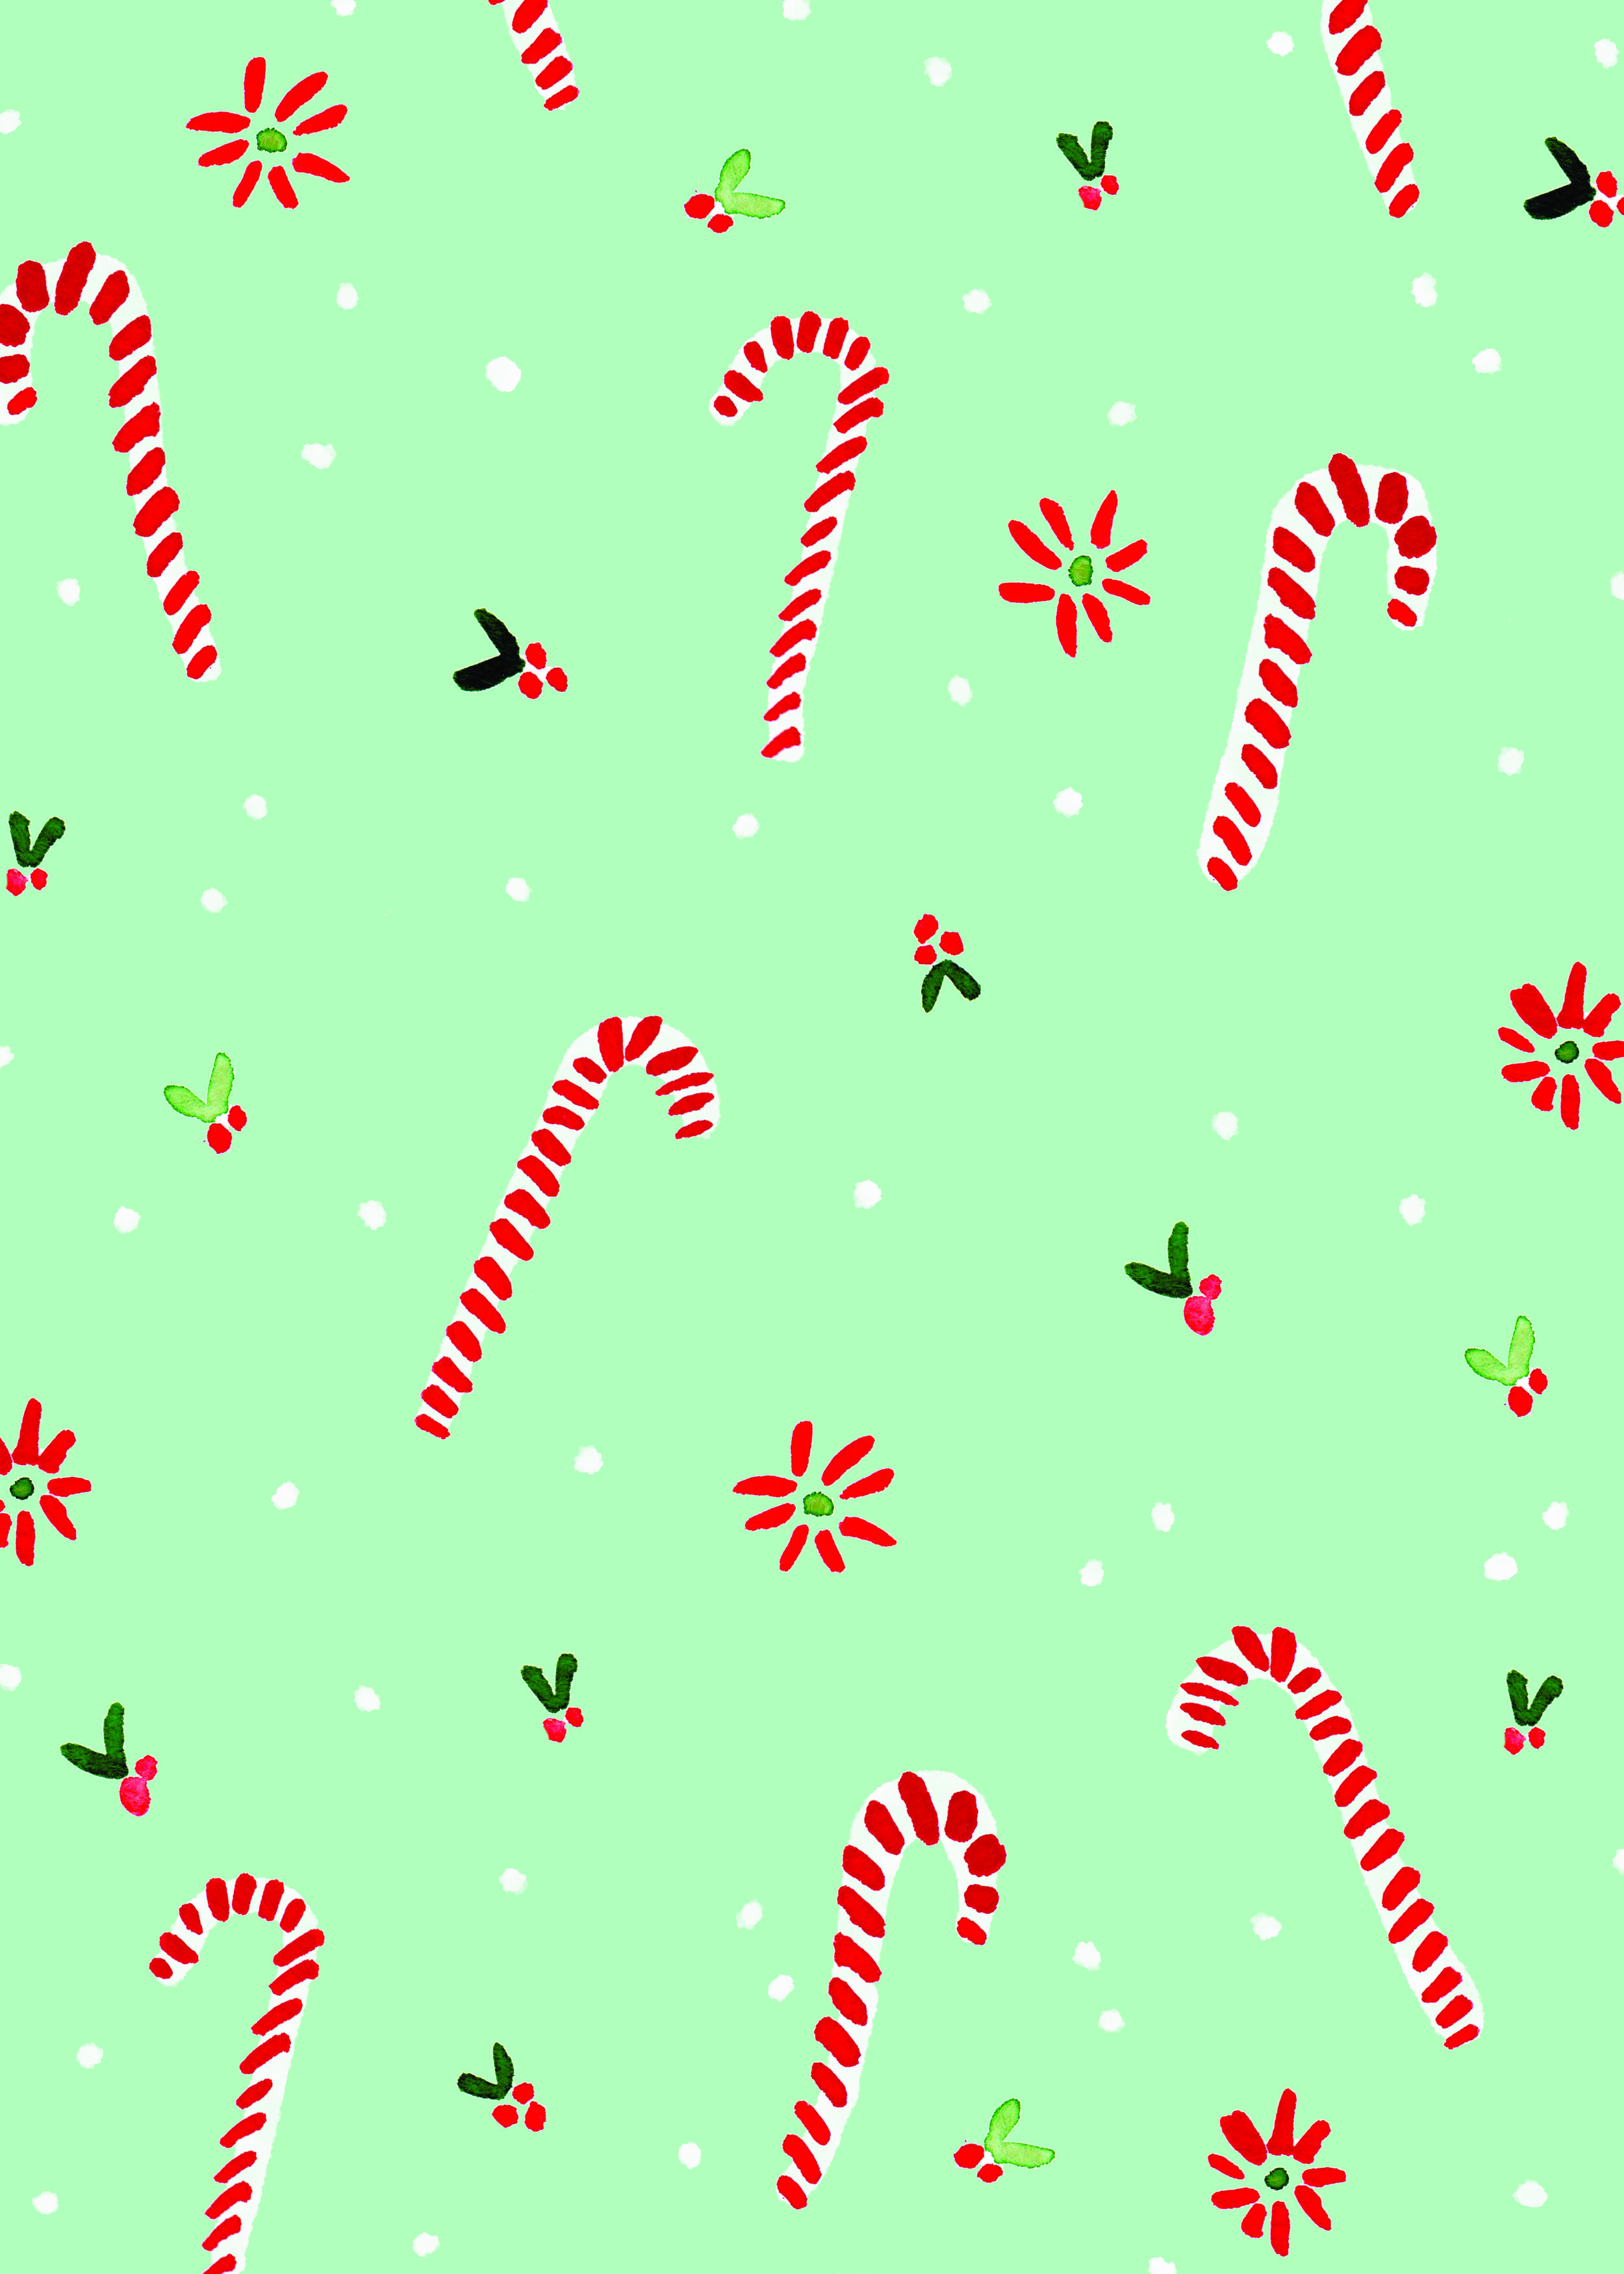 PatriceHorvath_Holidaypattern3.jpg